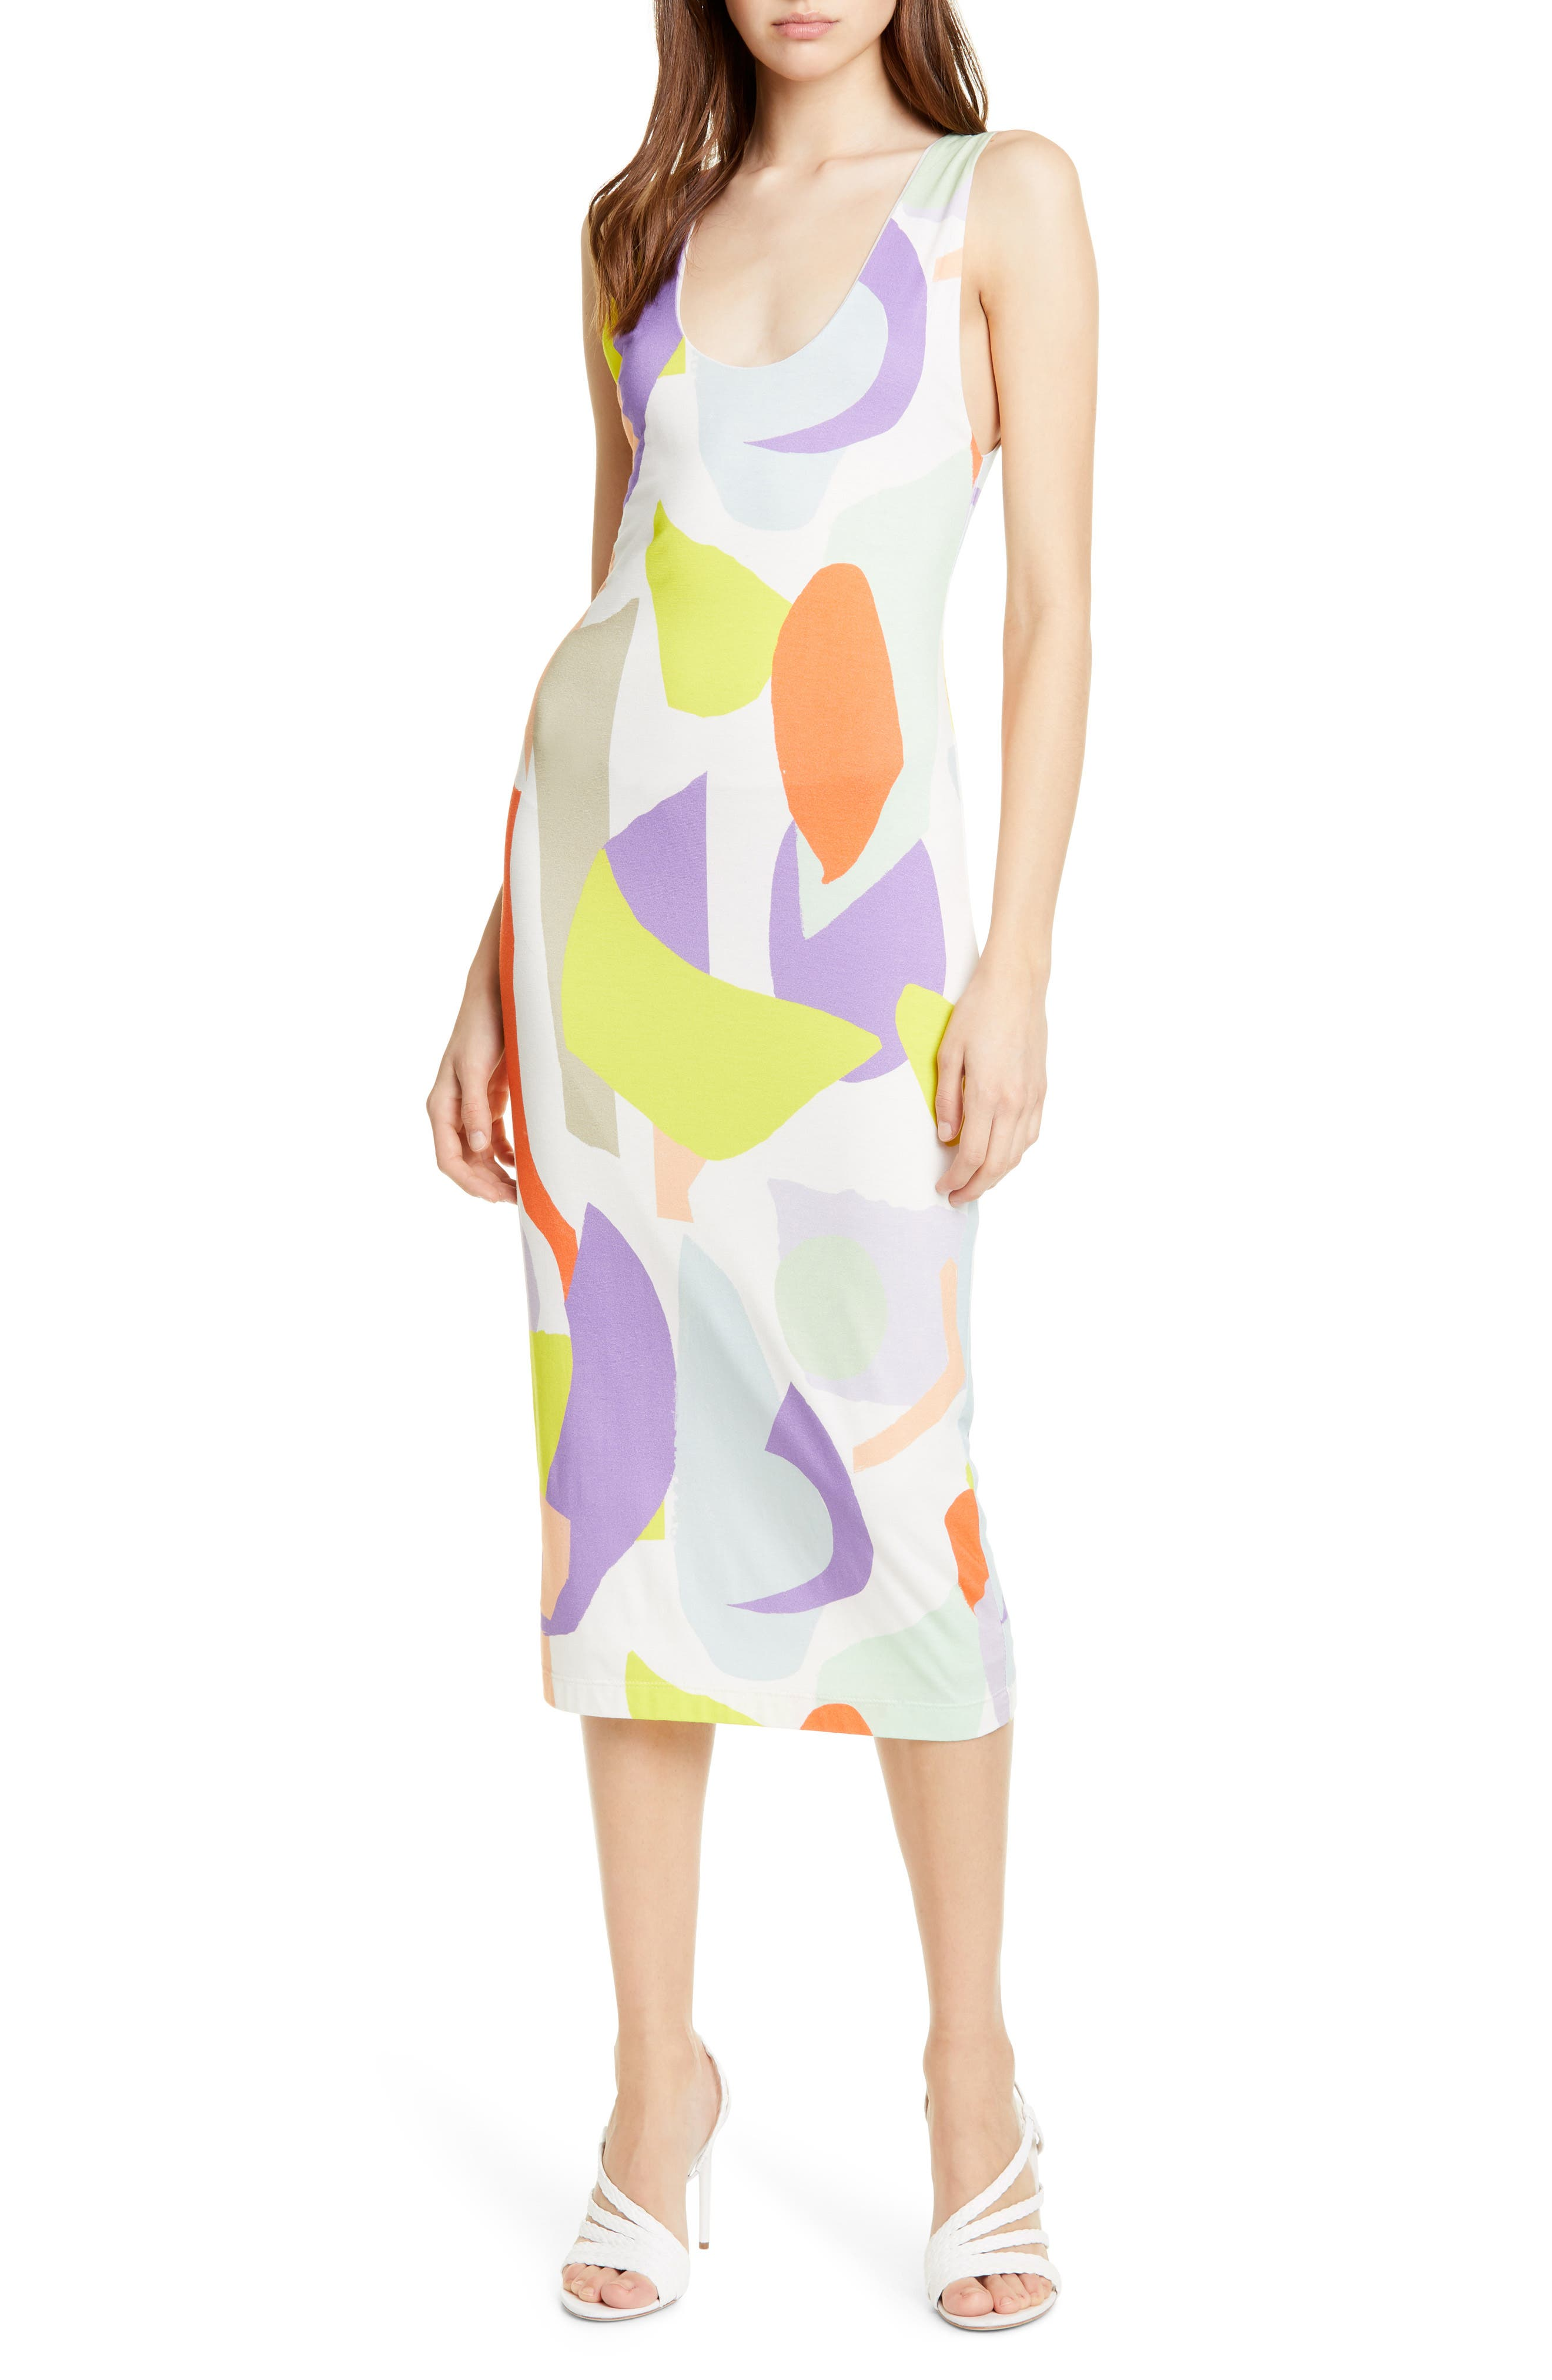 Alice + Olivia James Abstract Pattern Body-Con Tank Dress, Ivory